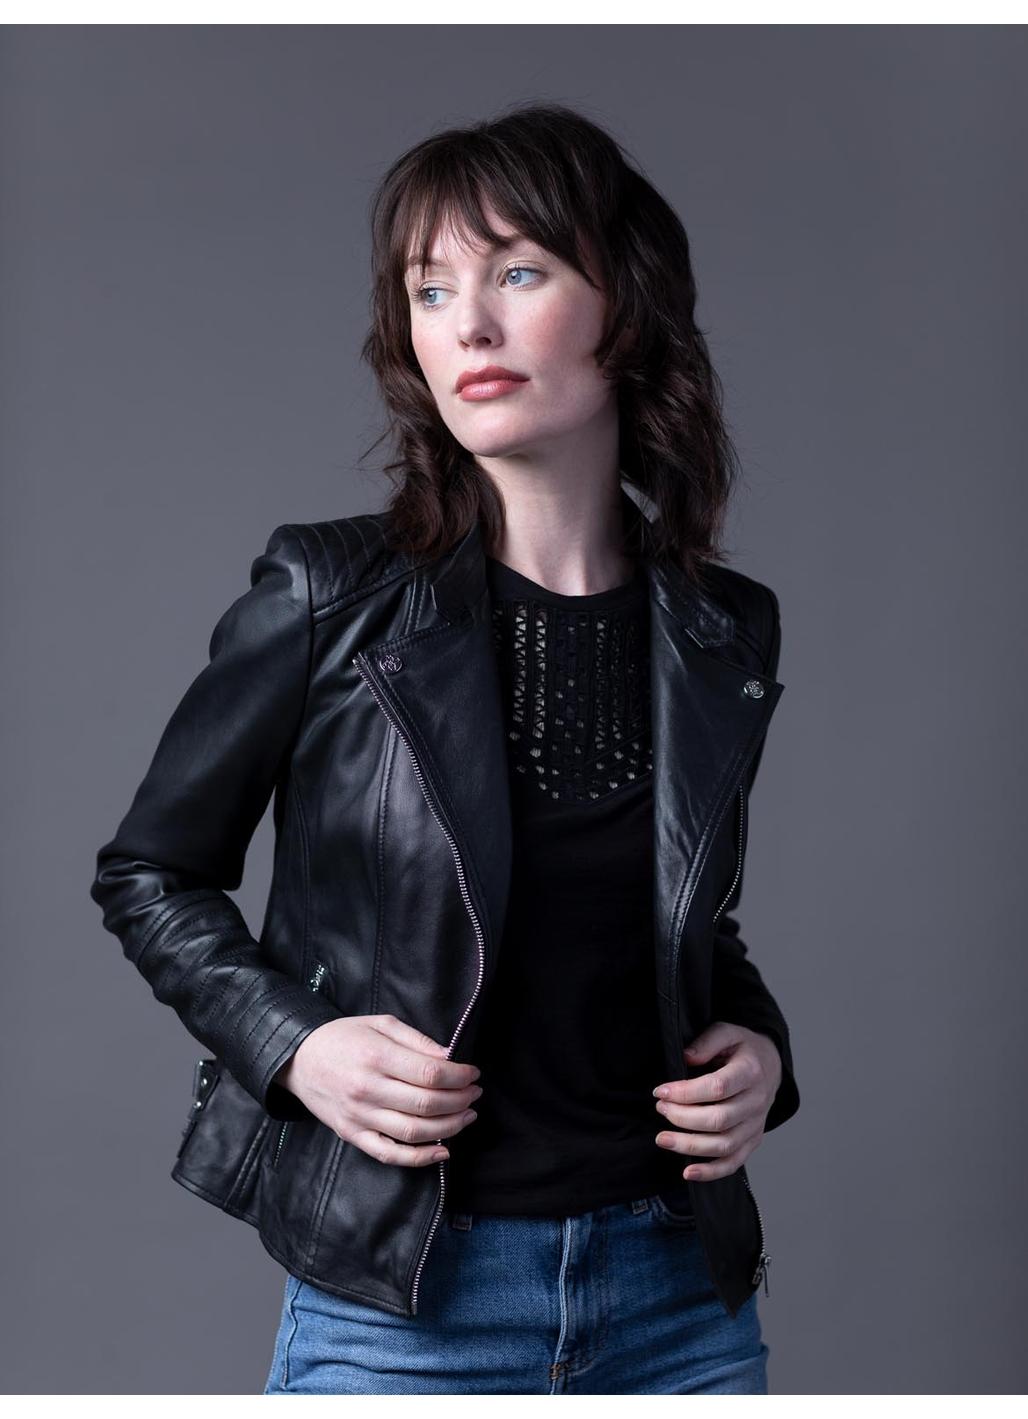 Toni Leather Biker Jacket in Black